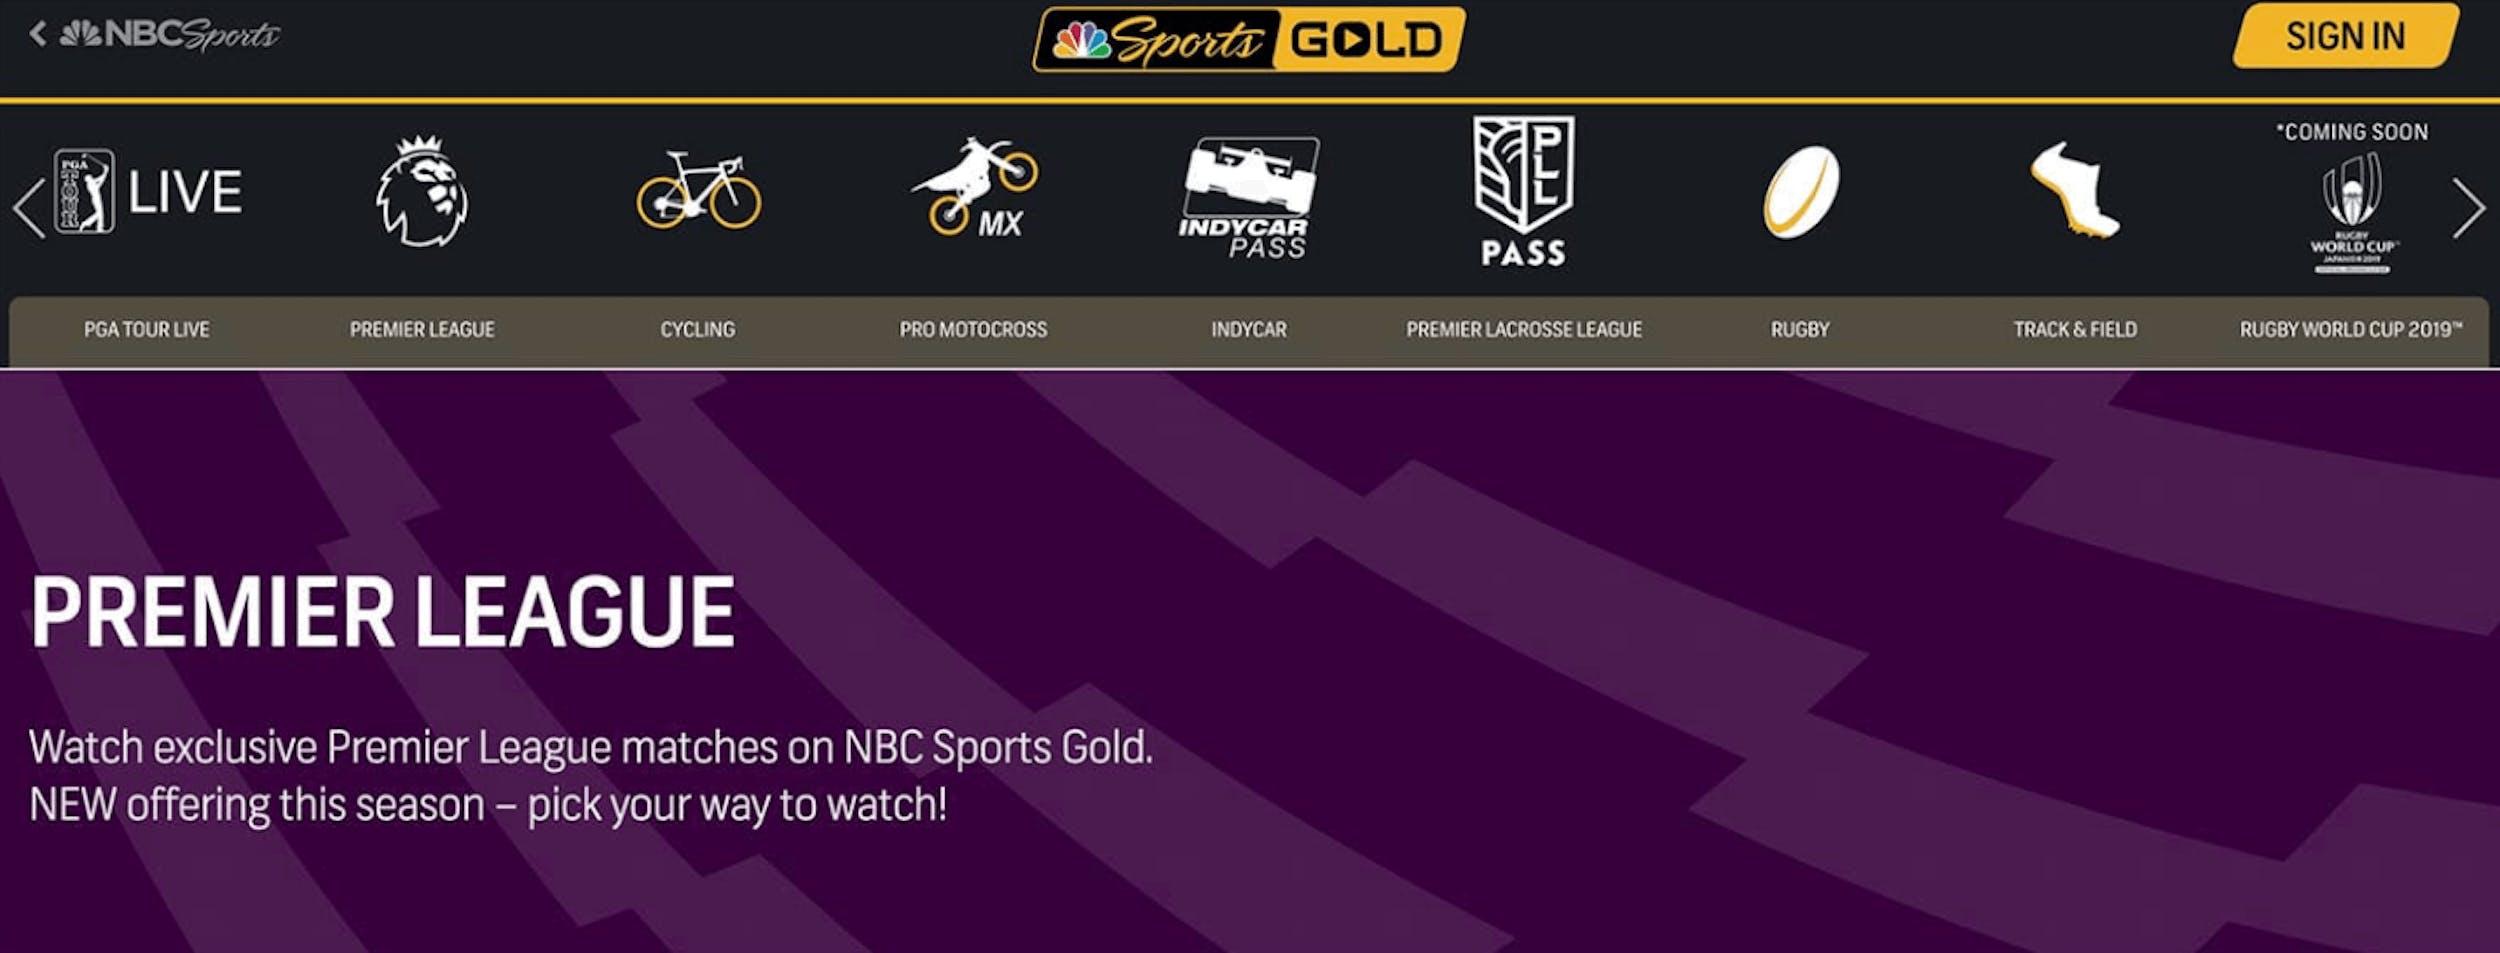 liverpool vs everton live stream nbc sports gold